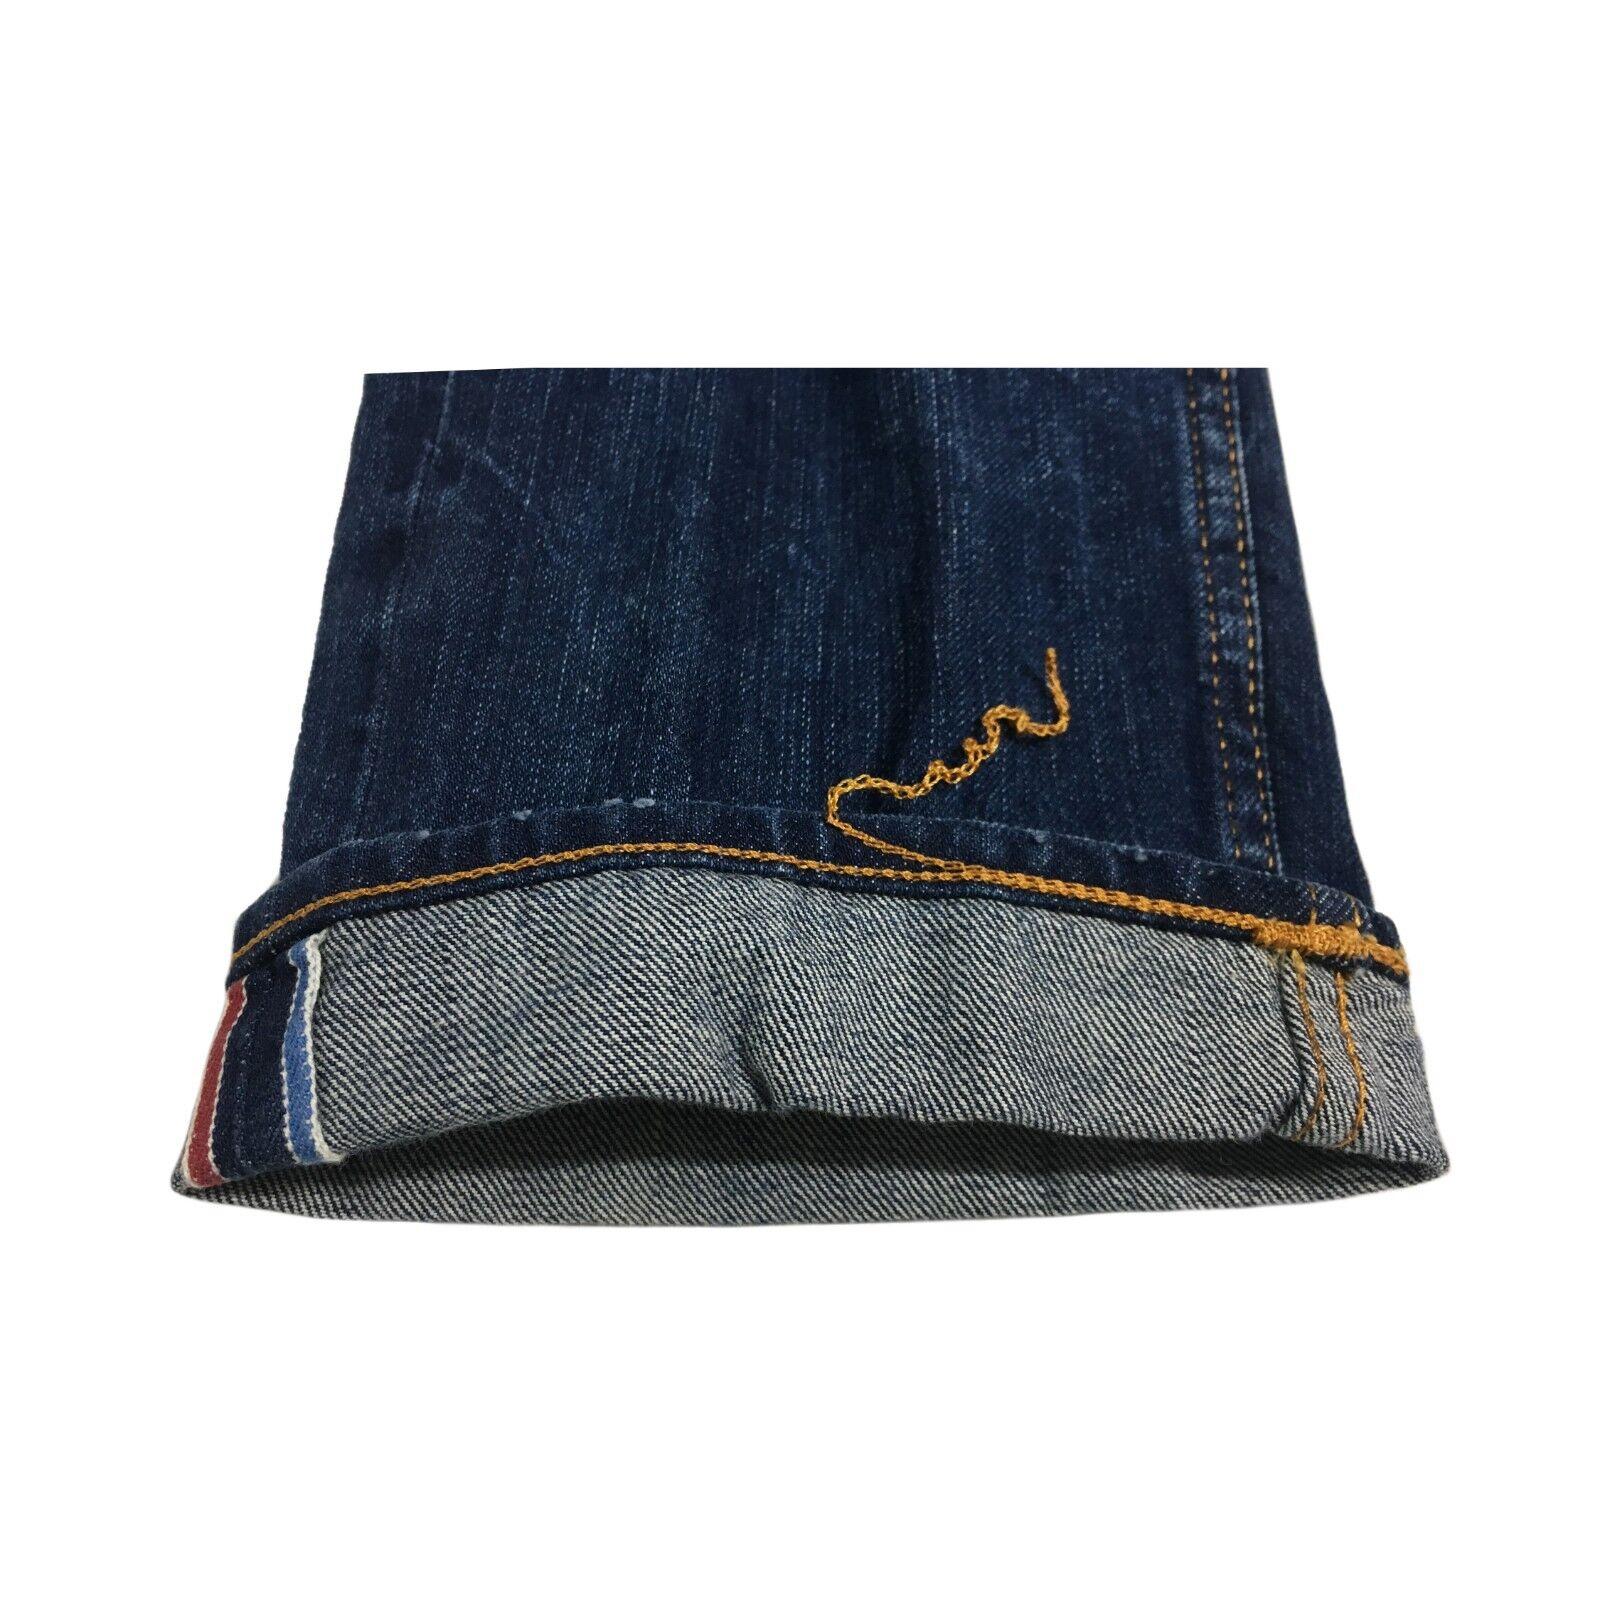 CARE LABEL jeans mod BLEU 402 HERITAGE 12 oz BLEU mod LINE 100% coton MADE IN ITALY 936e87